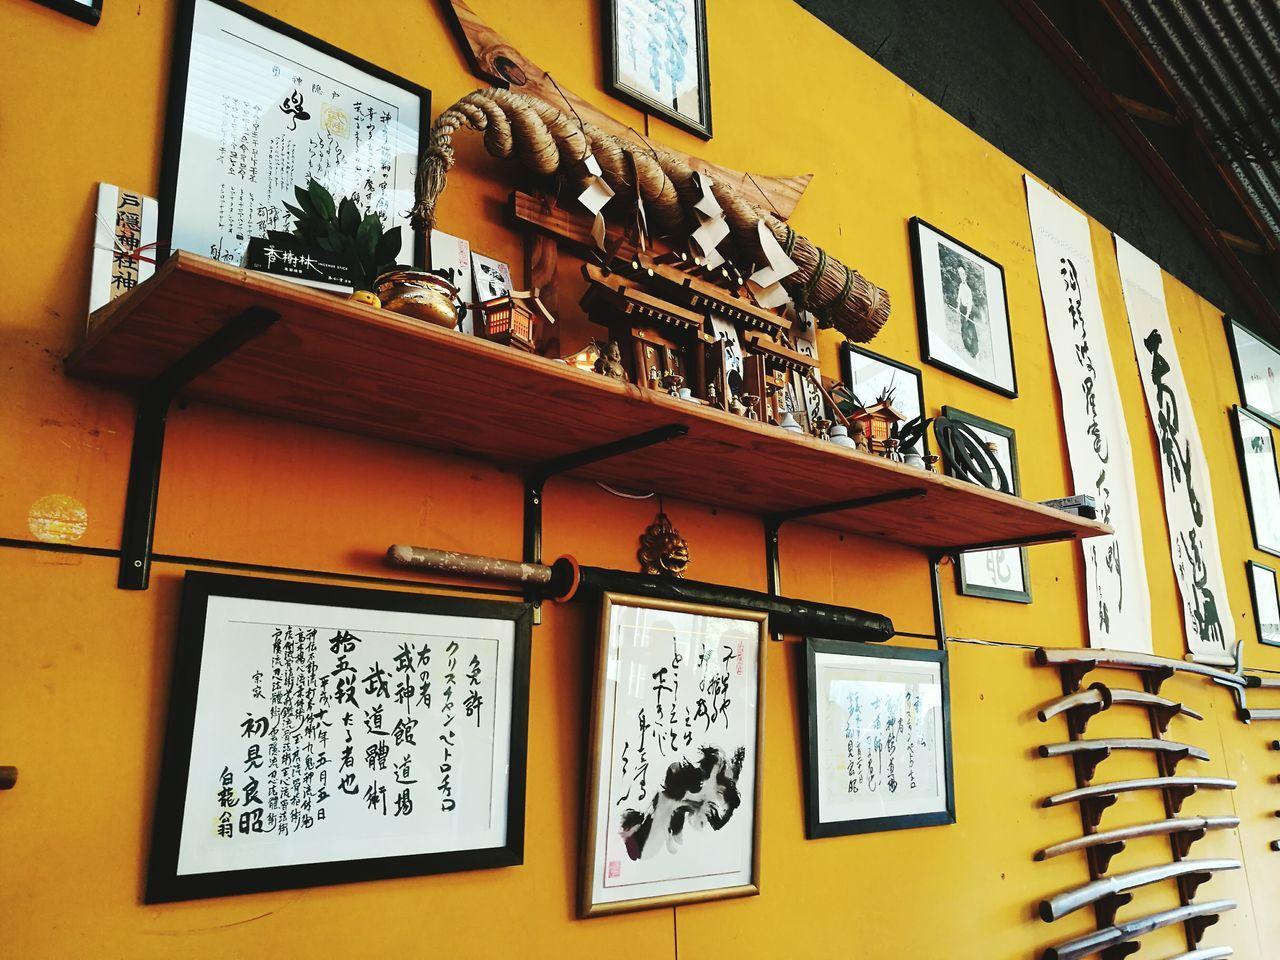 Bujinkan Tenryu Dojo - Castelar - Buenos Aires Bujinkan Budo Artesmarciales Ninjutsu Nihon Japon